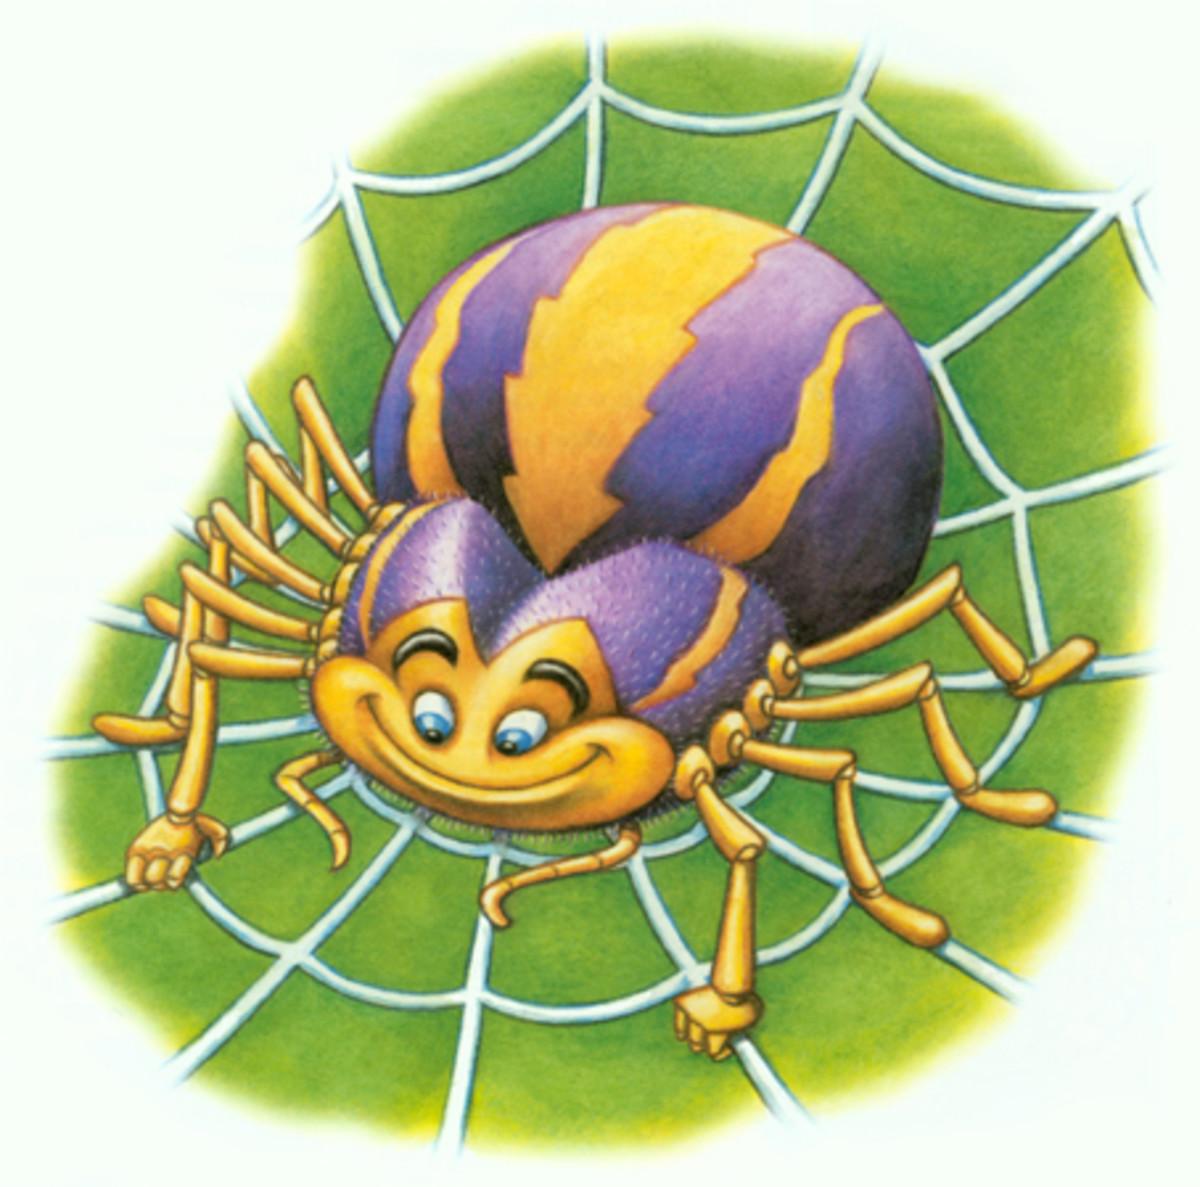 philippine-legend-the-legend-of-the-spider